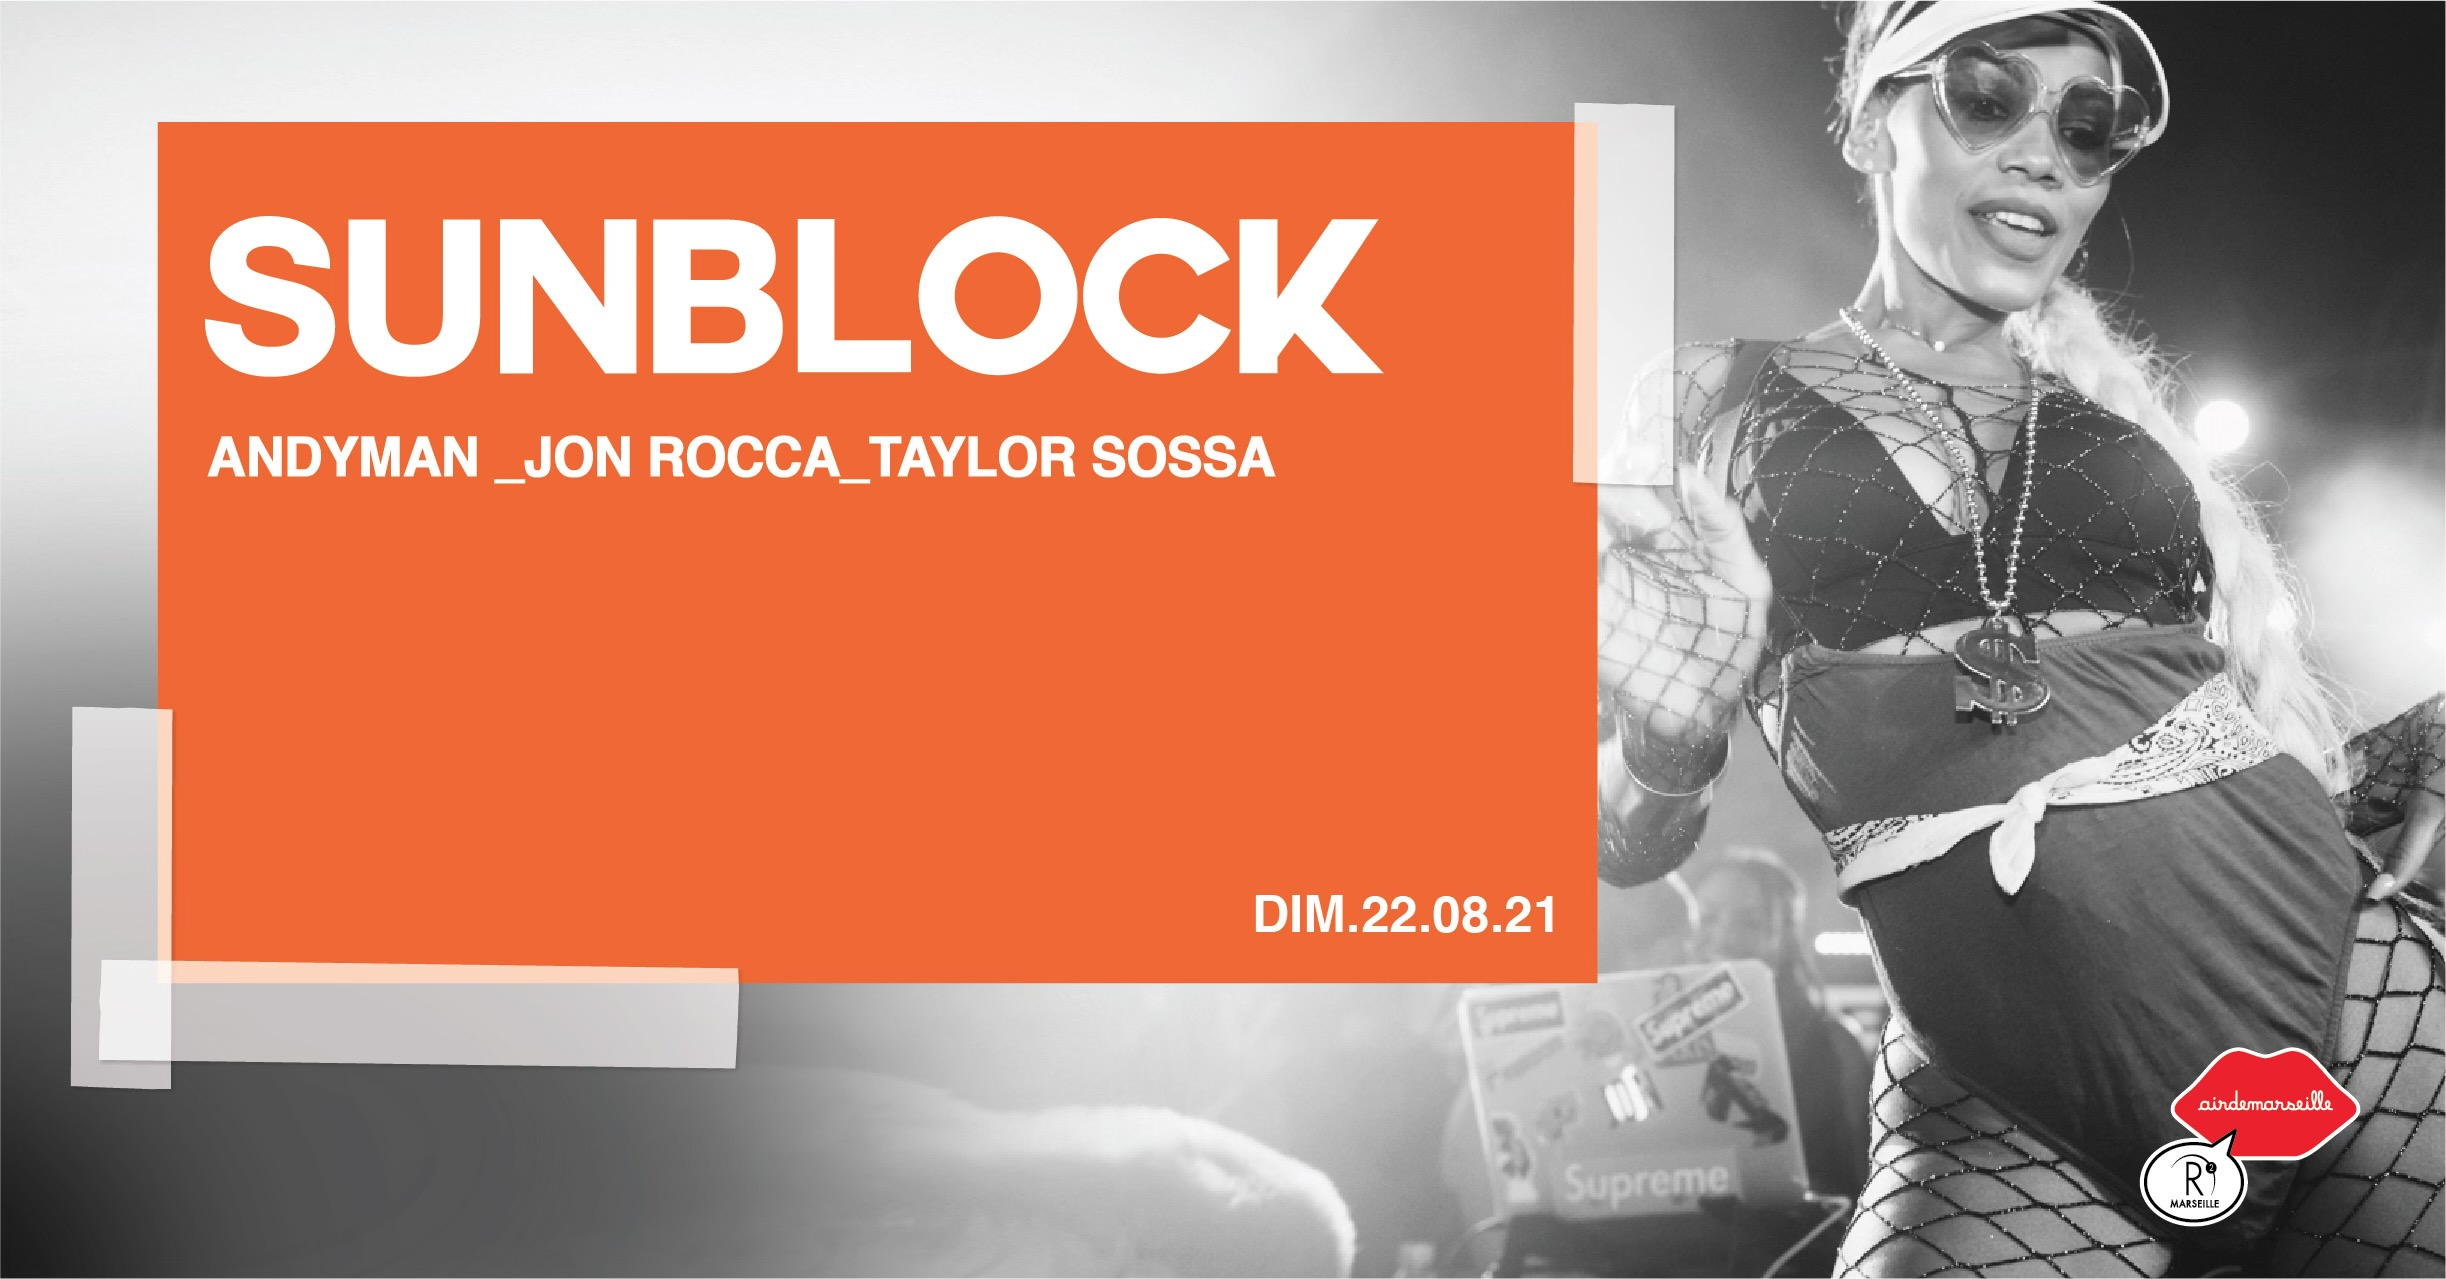 SUNBLOCK x ANDYMAN - JON ROCCA - TAYLOR SOSSA